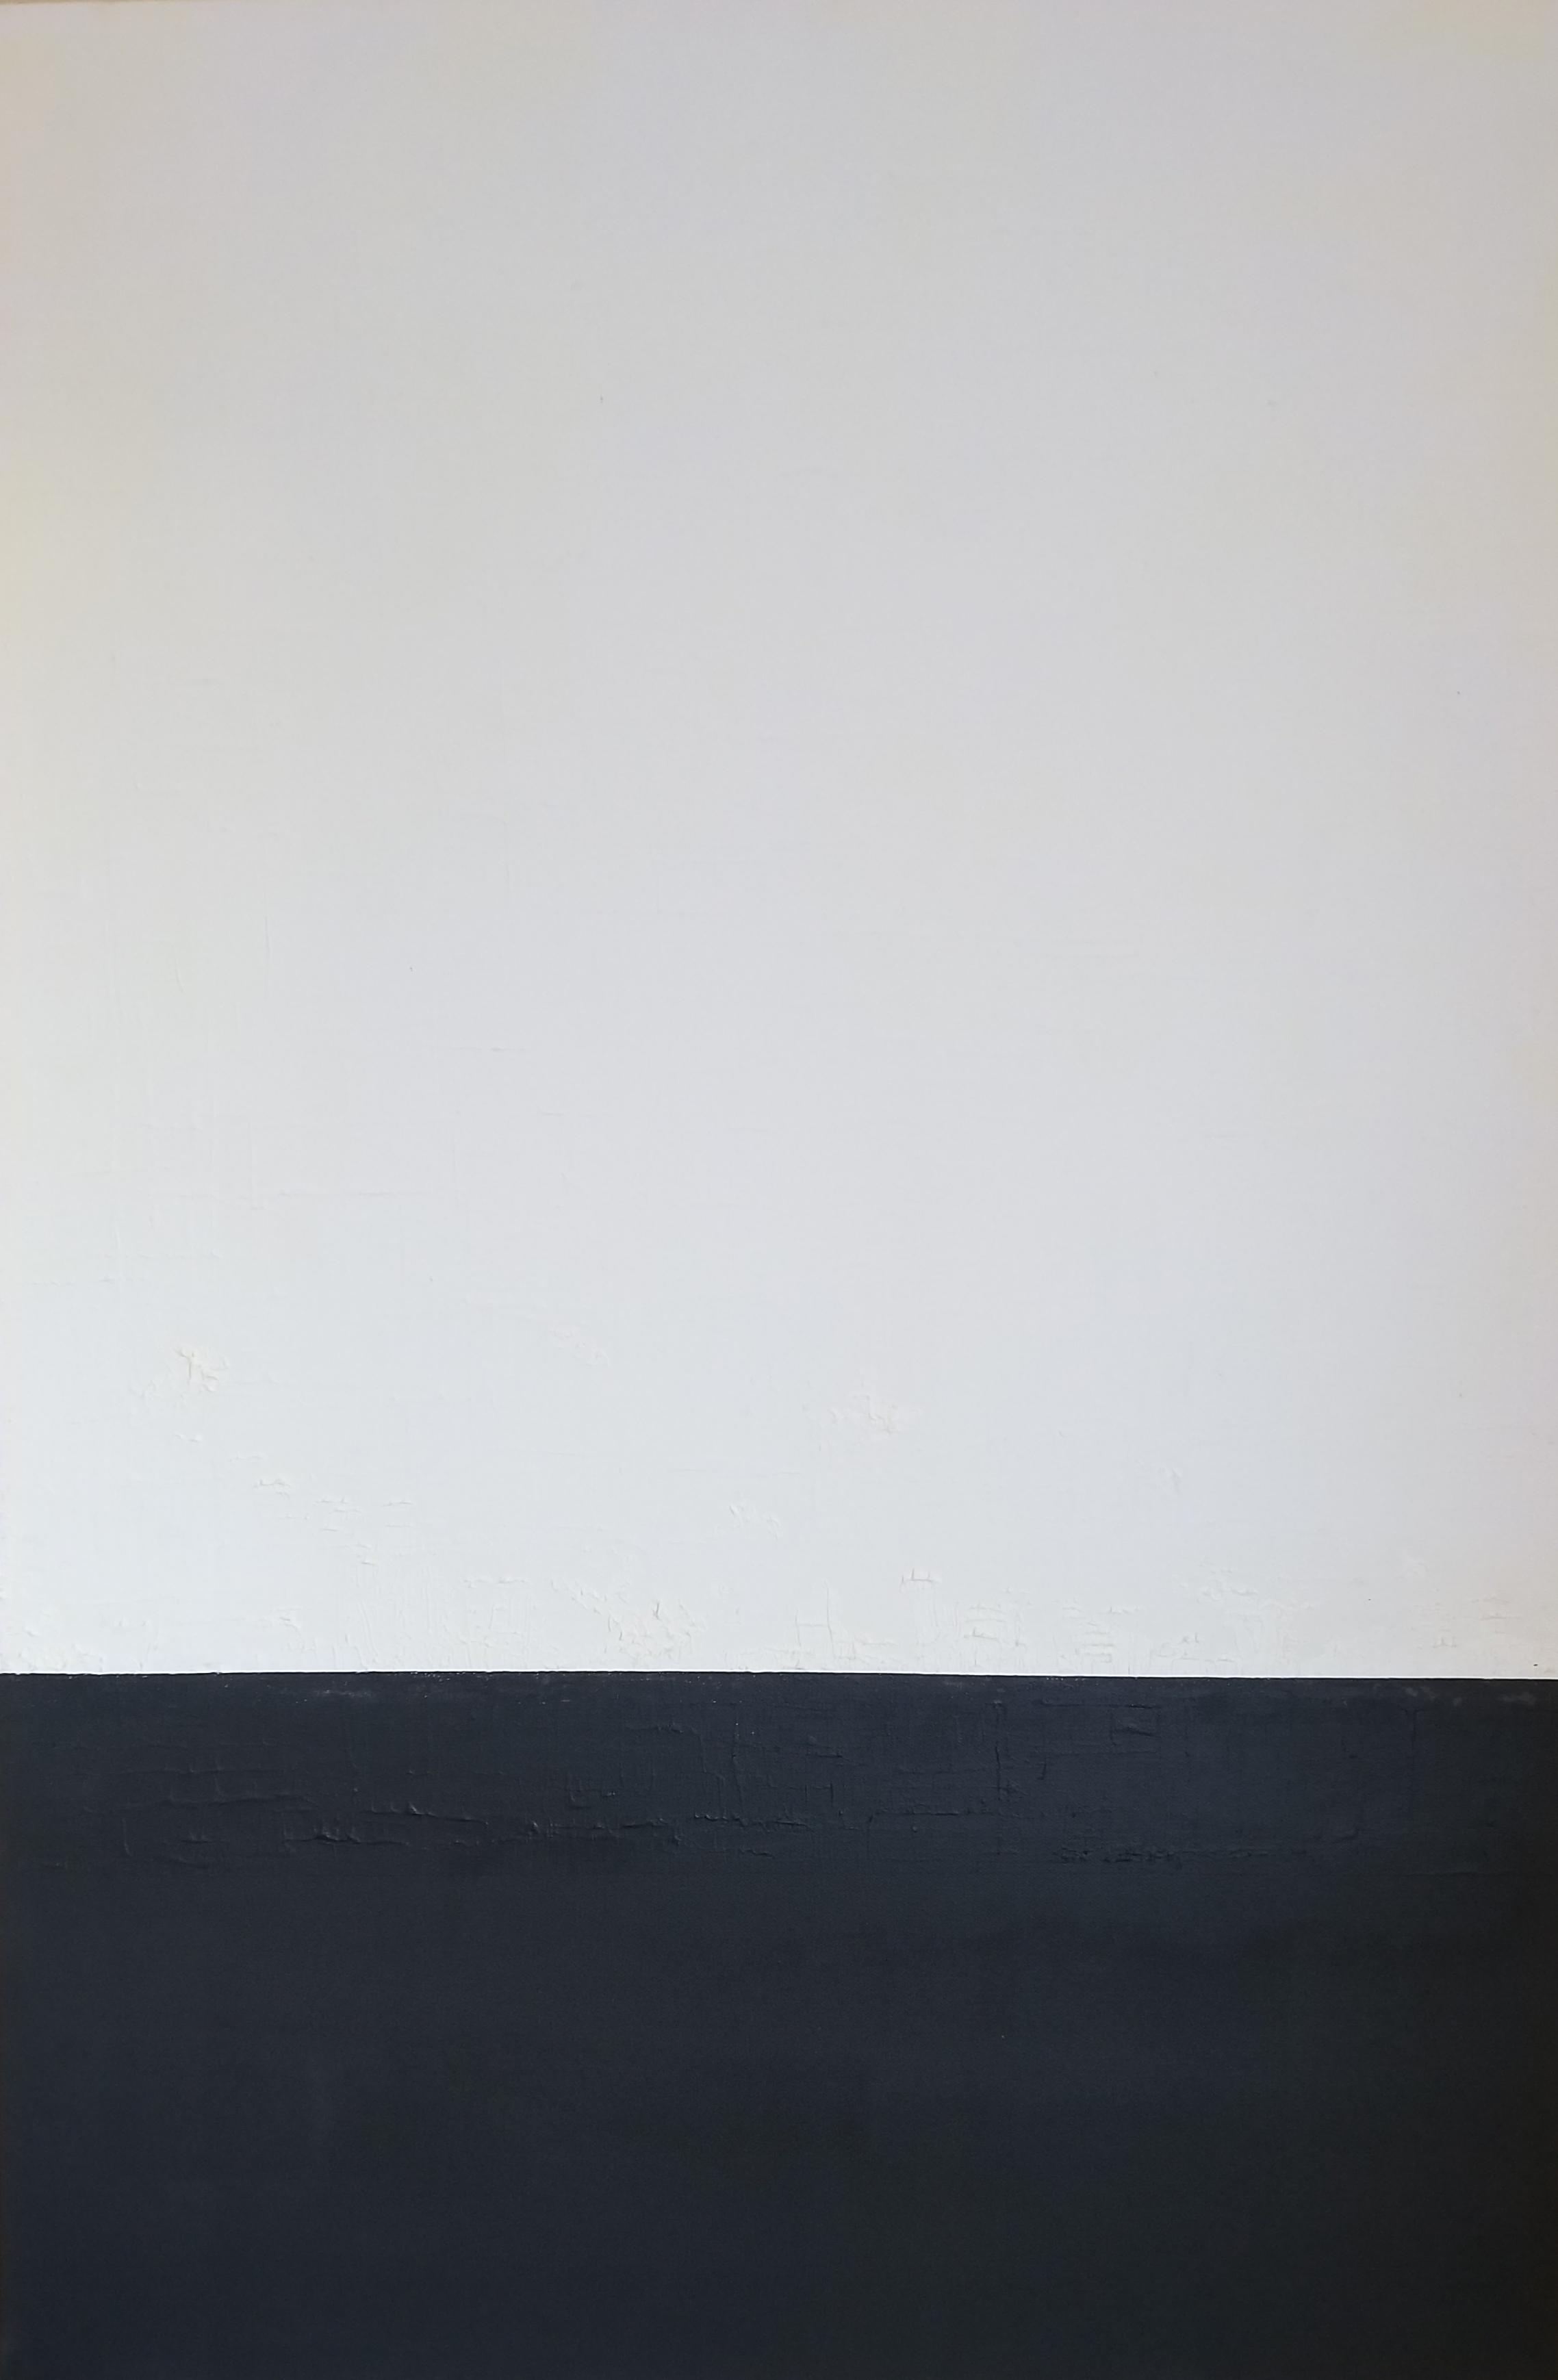 White on Black Untitled, 2018